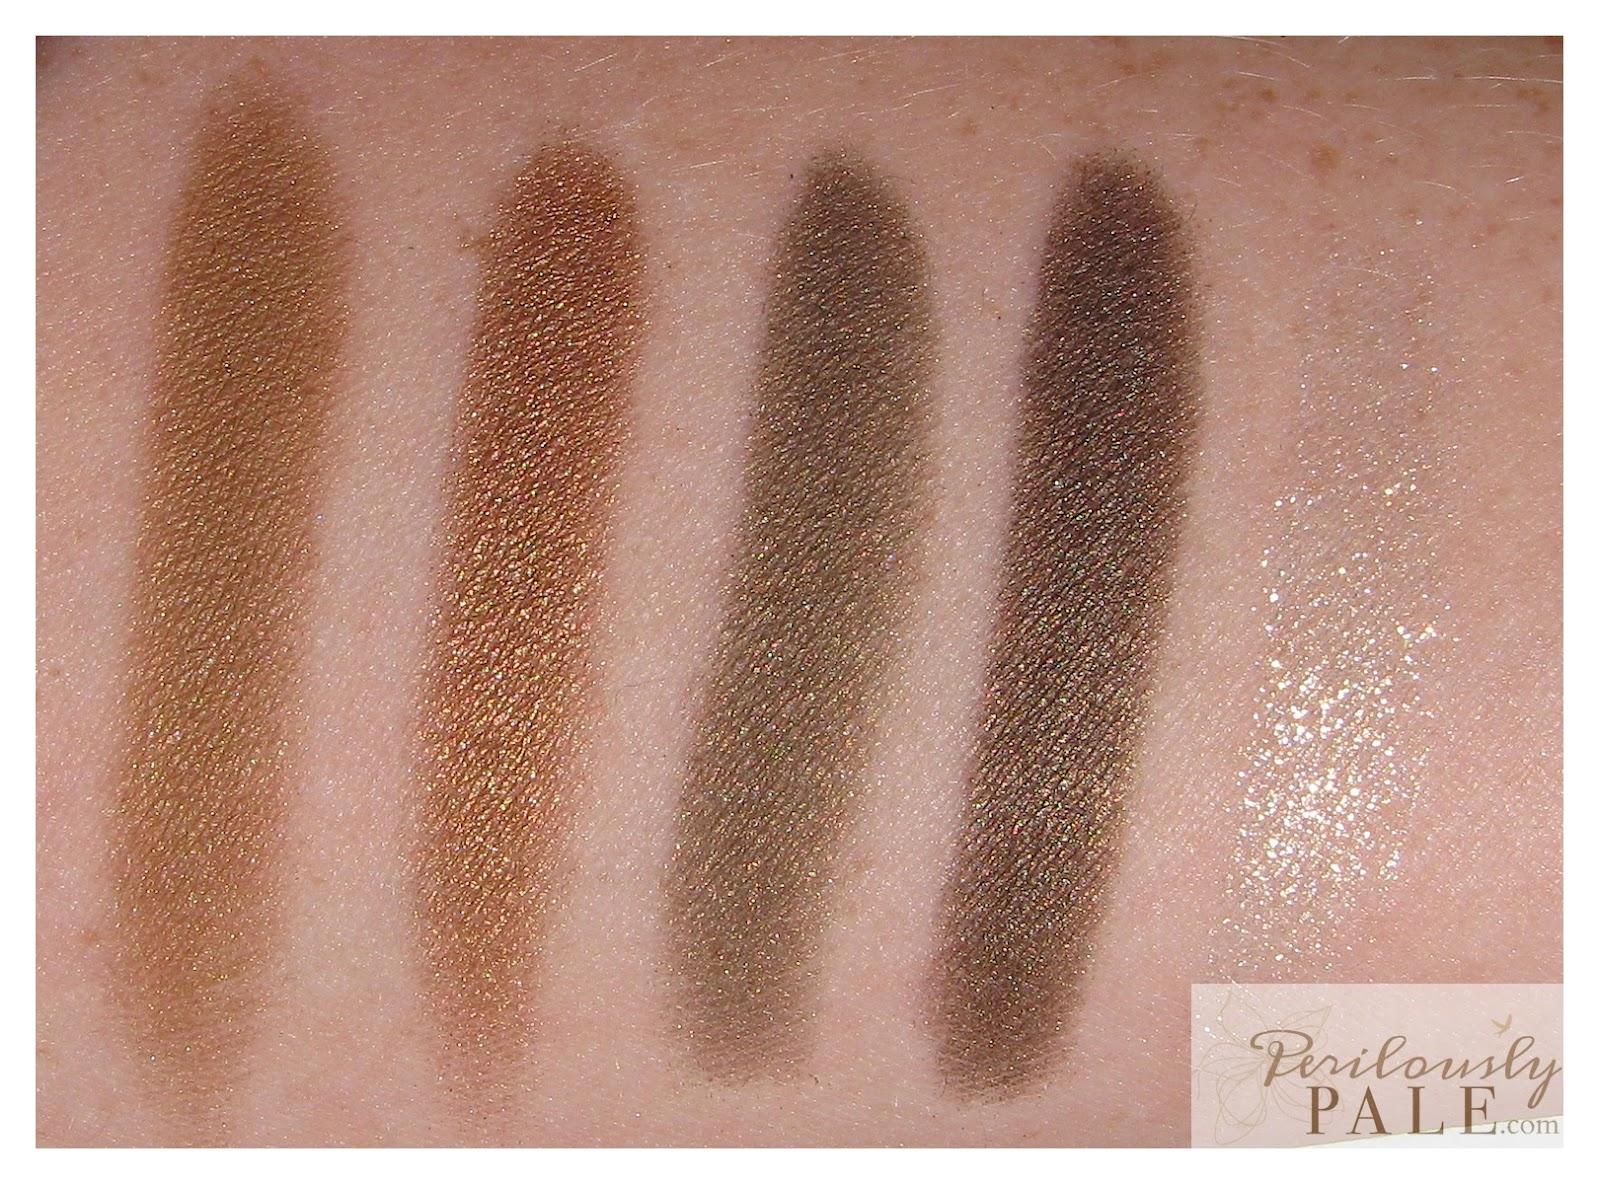 Dior 5 Couleurs Eye Shadow Palette In 774 Golden Savannah